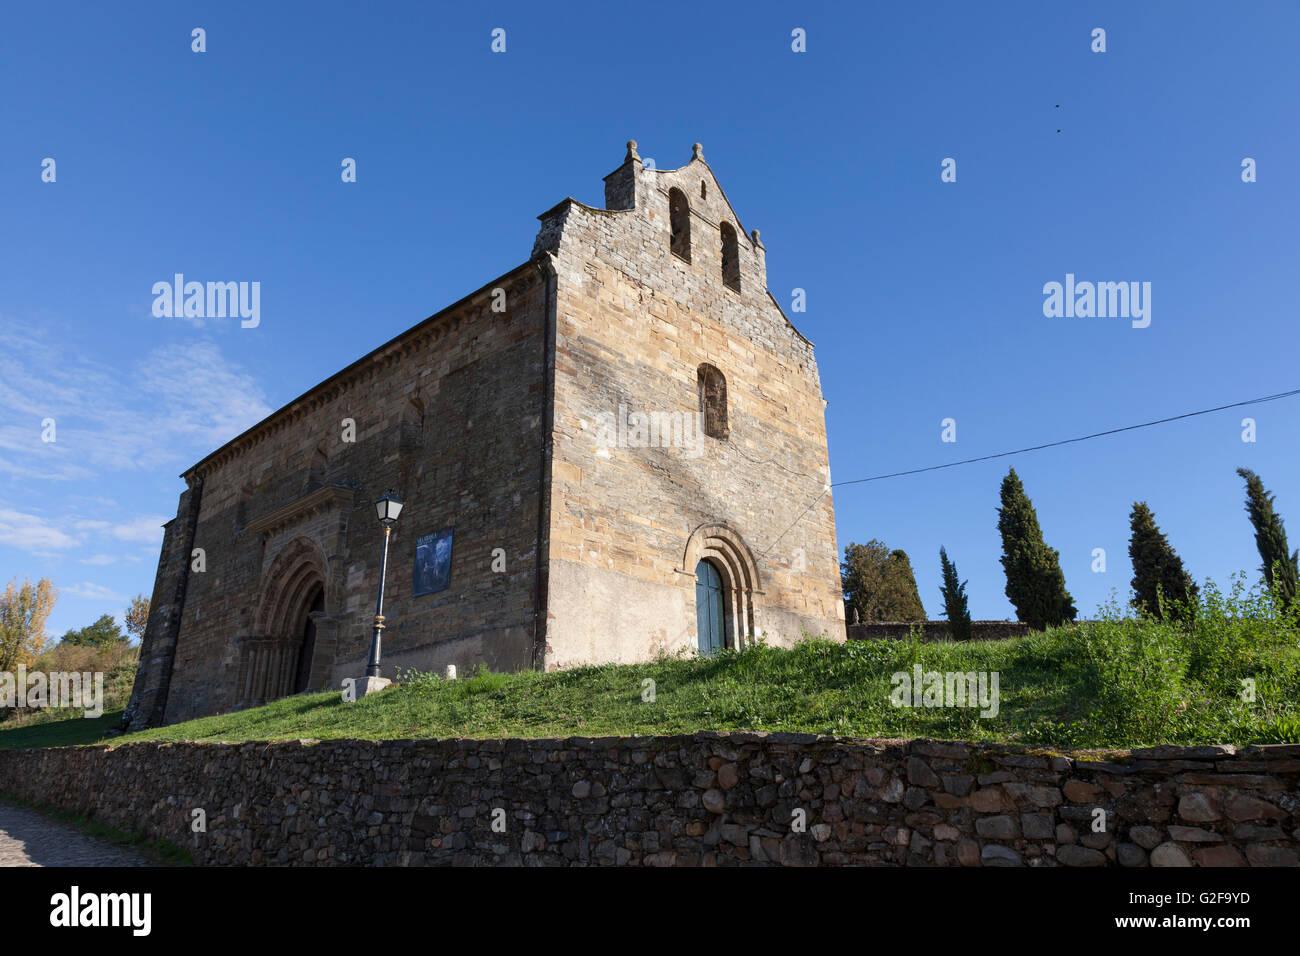 Villafranca del Bierzo, Spain: Iglesia de Santiago Apóstol. - Stock Image